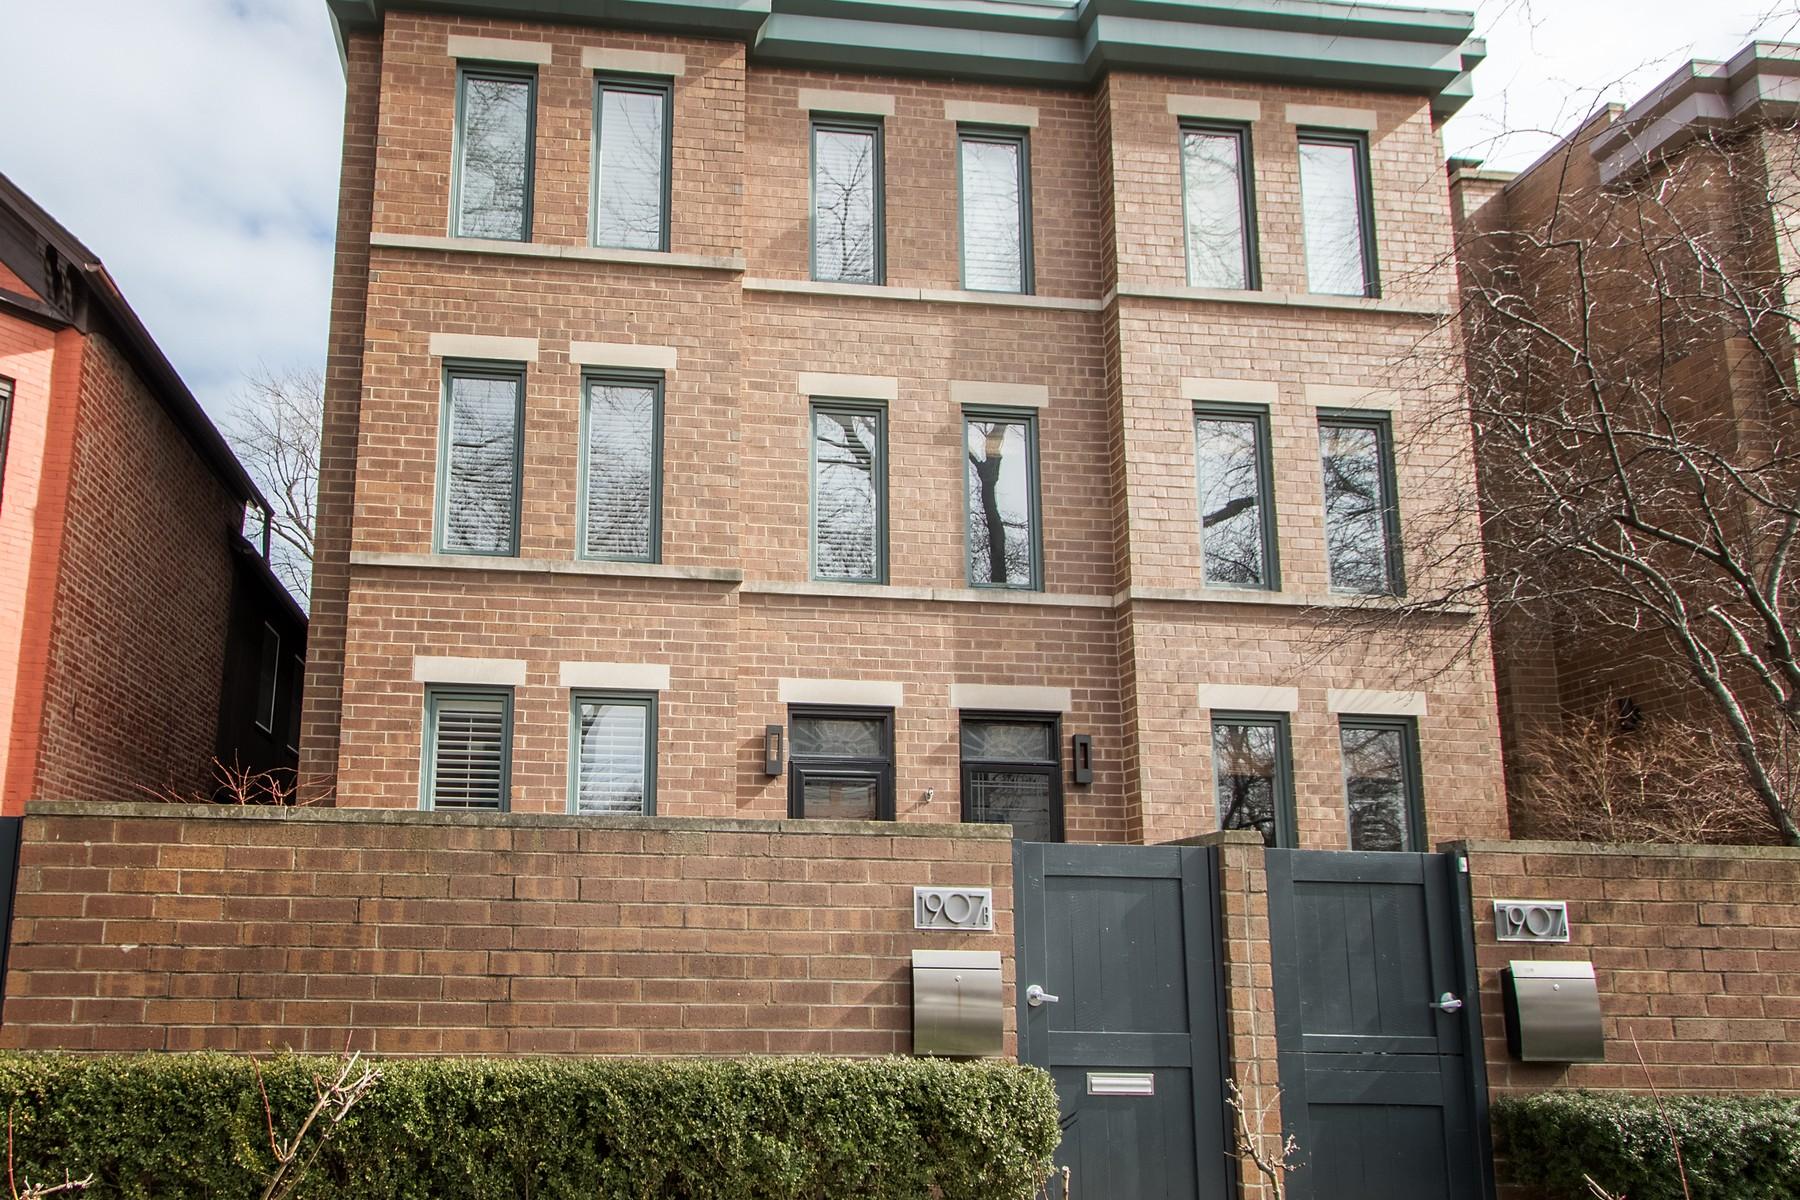 联栋屋 为 销售 在 Perfect Lincoln Park Townhome 1907 N Cleveland Avenue Unit B Lincoln Park, 芝加哥, 伊利诺斯州, 60614 美国